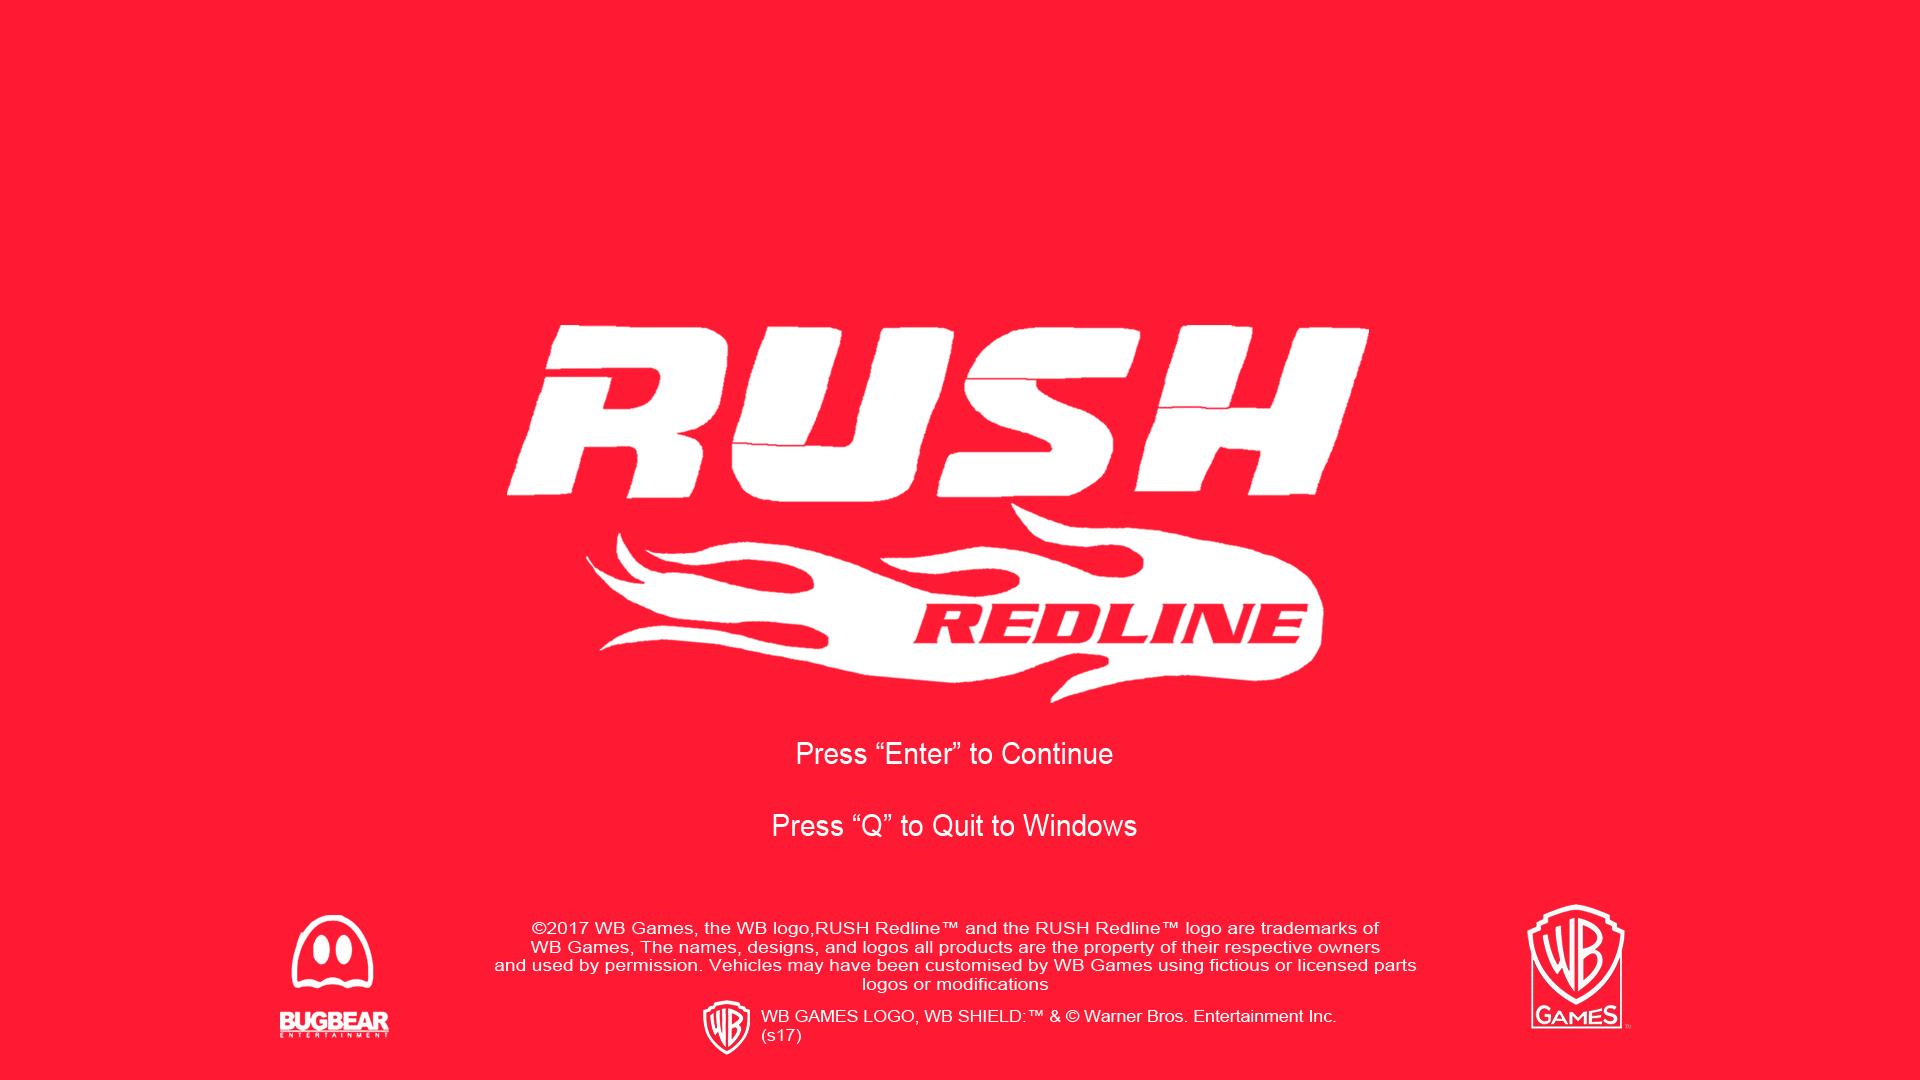 RUSH Redline Pre-Alpha screen by Rainbow-Dash-Rockz